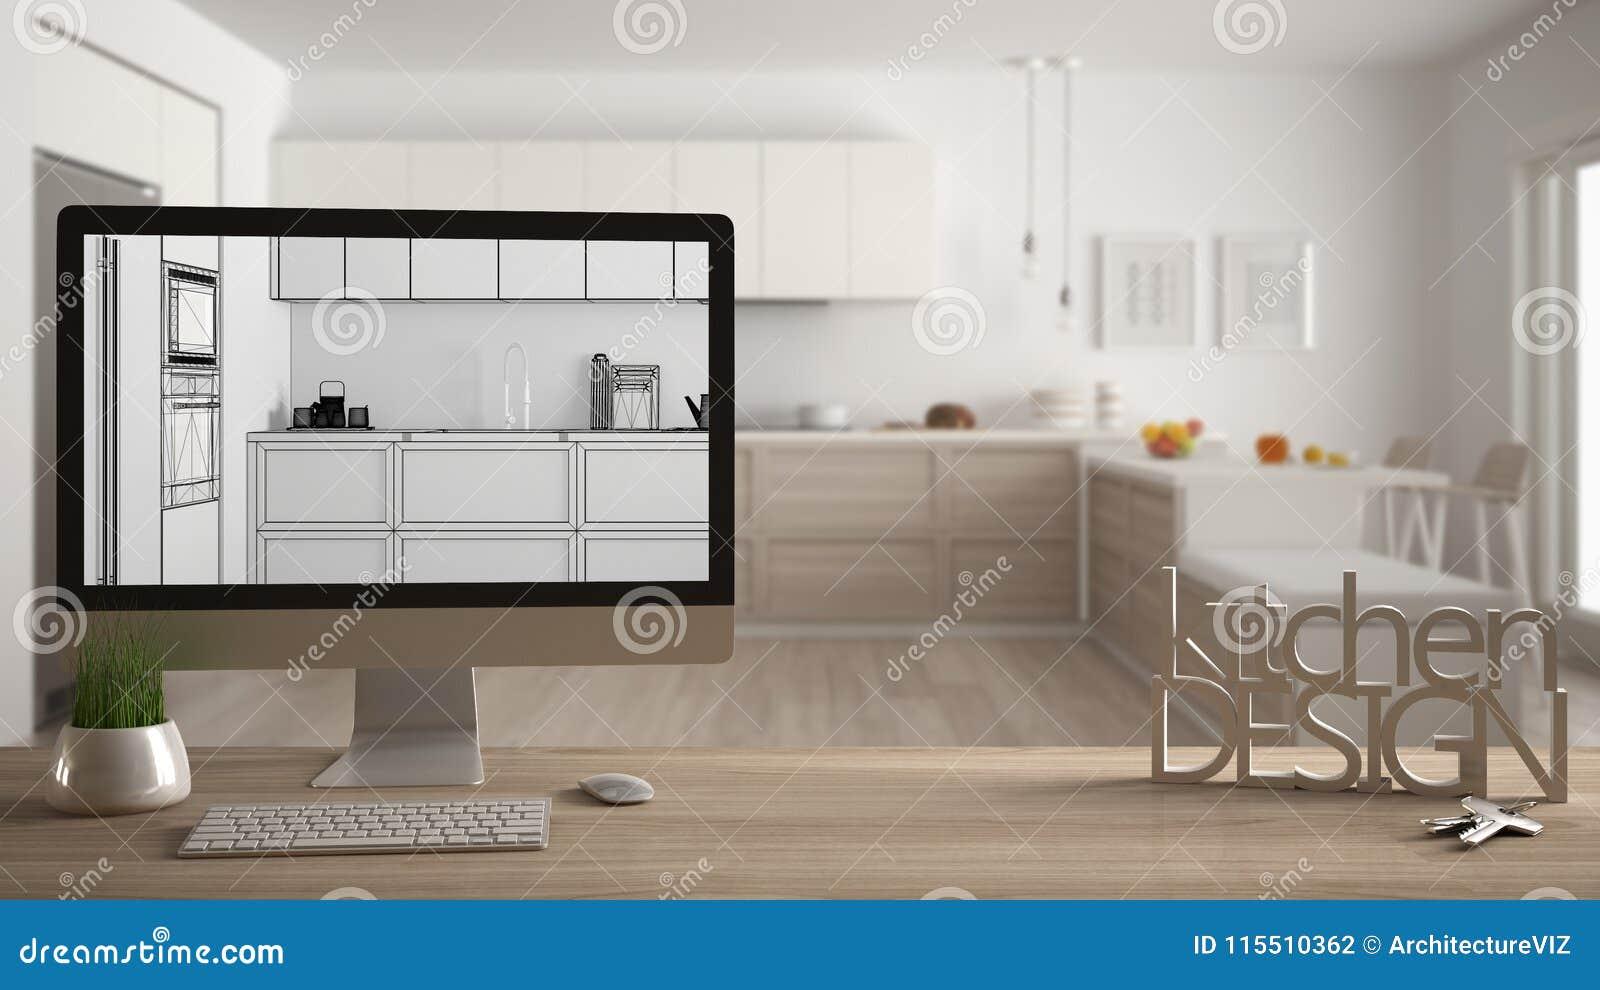 Architect designer project concept, wooden table with house keys, letters kitchen design and desktop showing blueprint CAD sketch,